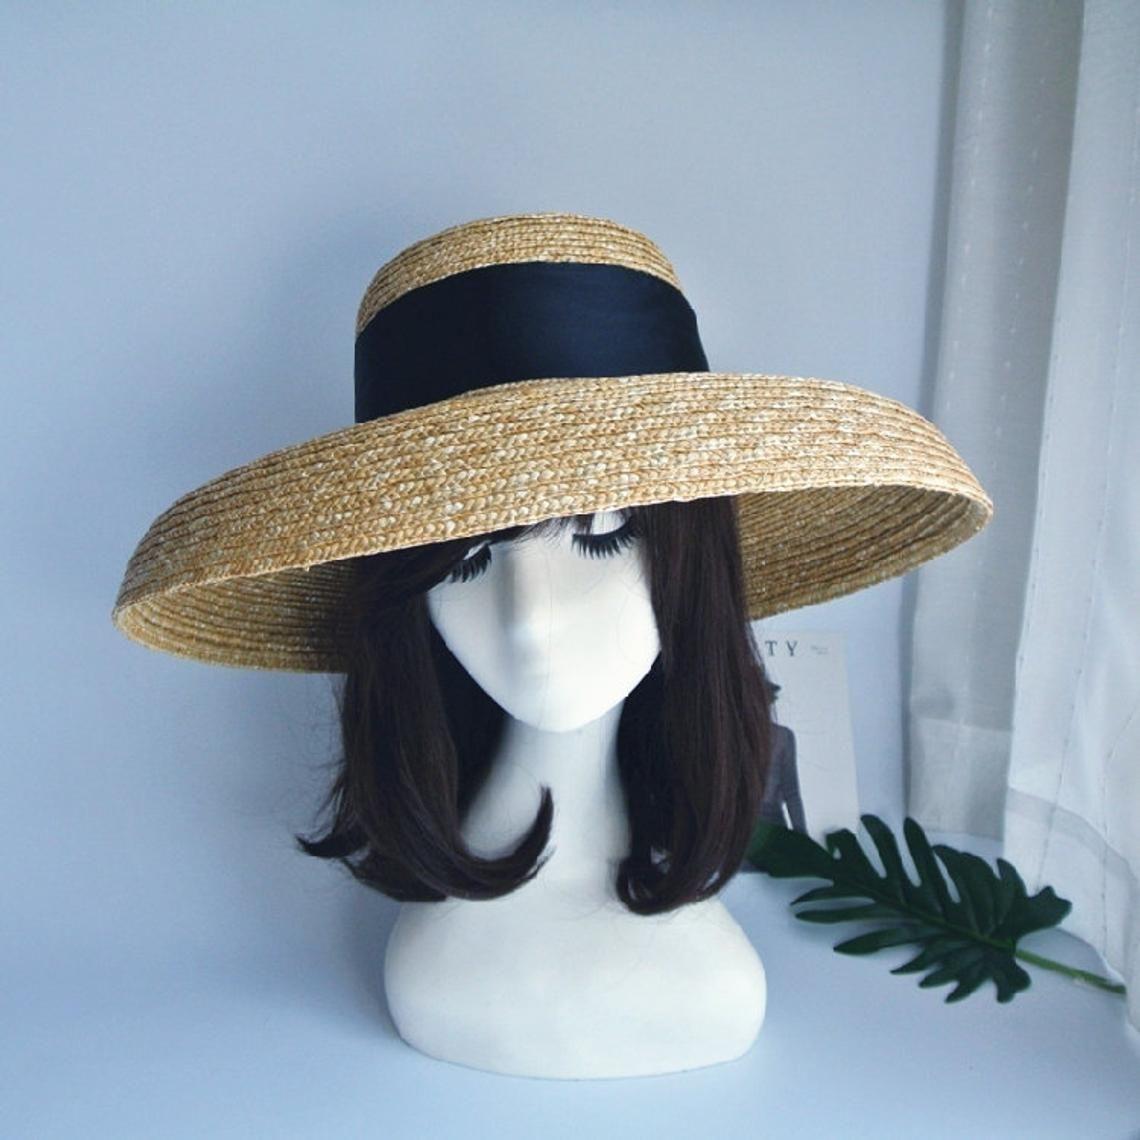 French Retro Summer Sun Hat Holiday Beach Black Big Bell Etsy Summer Straw Hat Summer Sun Hat Retro Summer